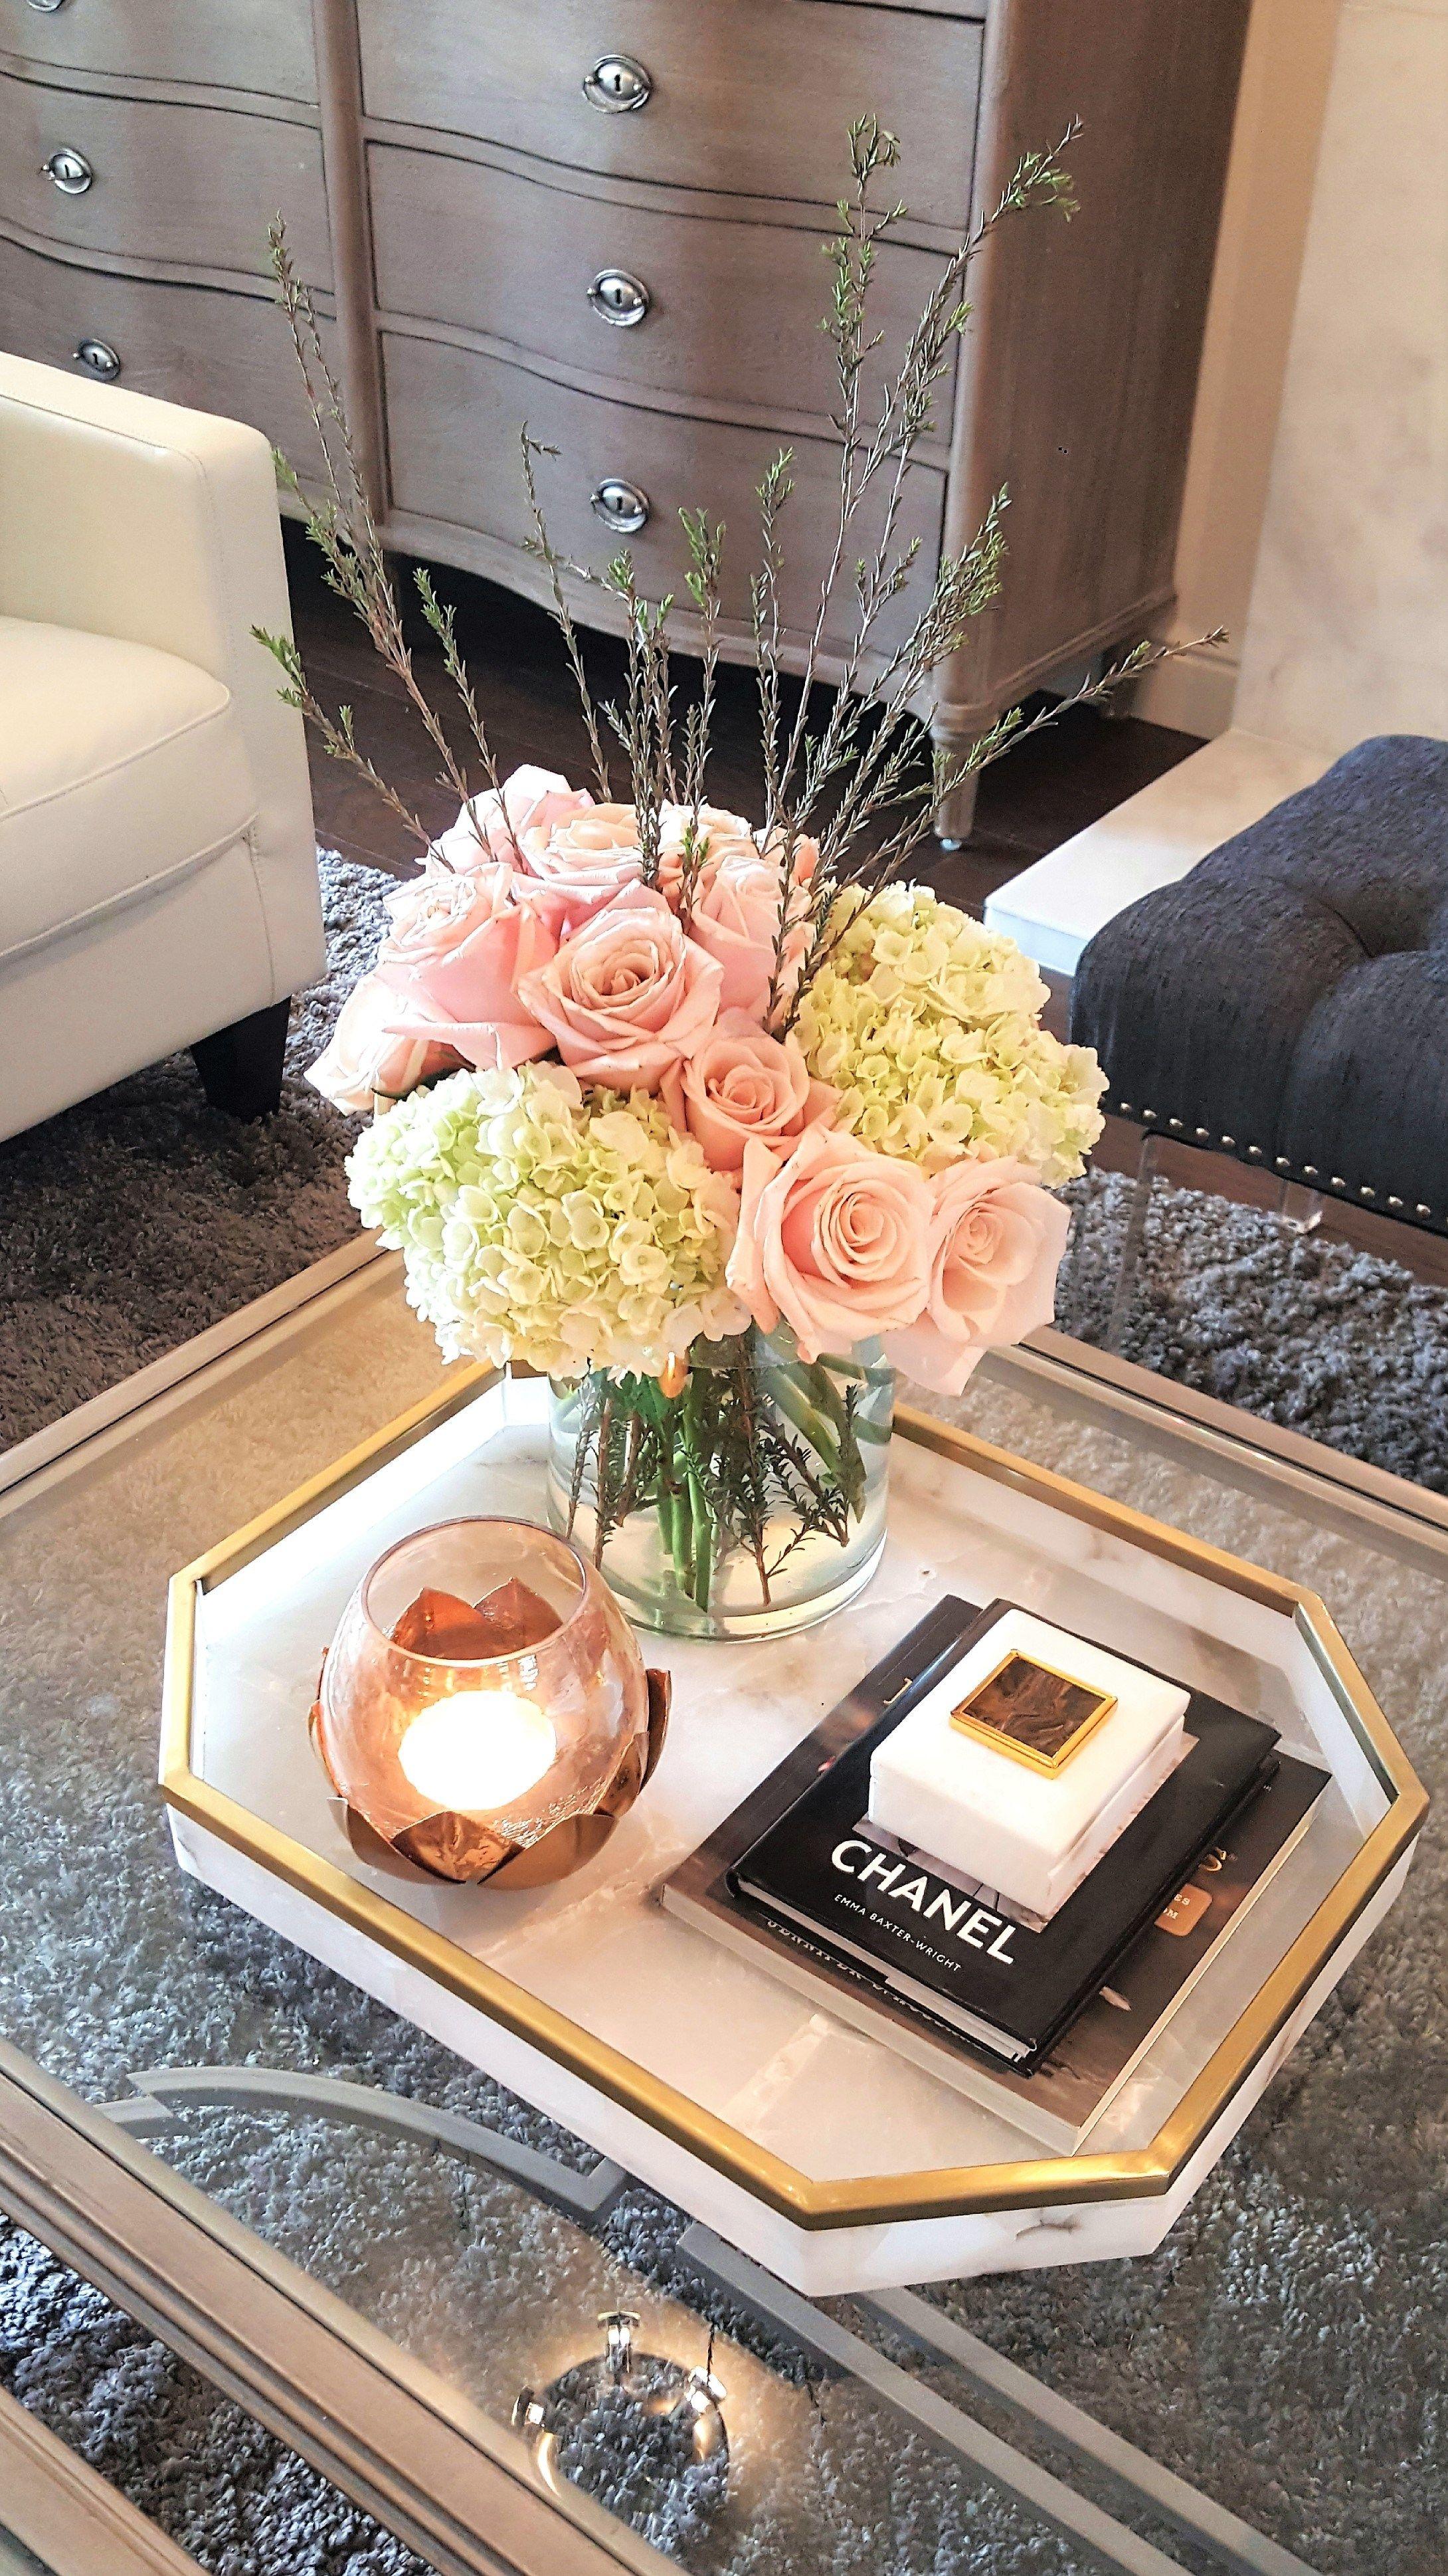 Simple Spring Home Decor Ideas Home With Holliday Coffee Table Decor Tray Coffe Table Decor Spring Home Decor